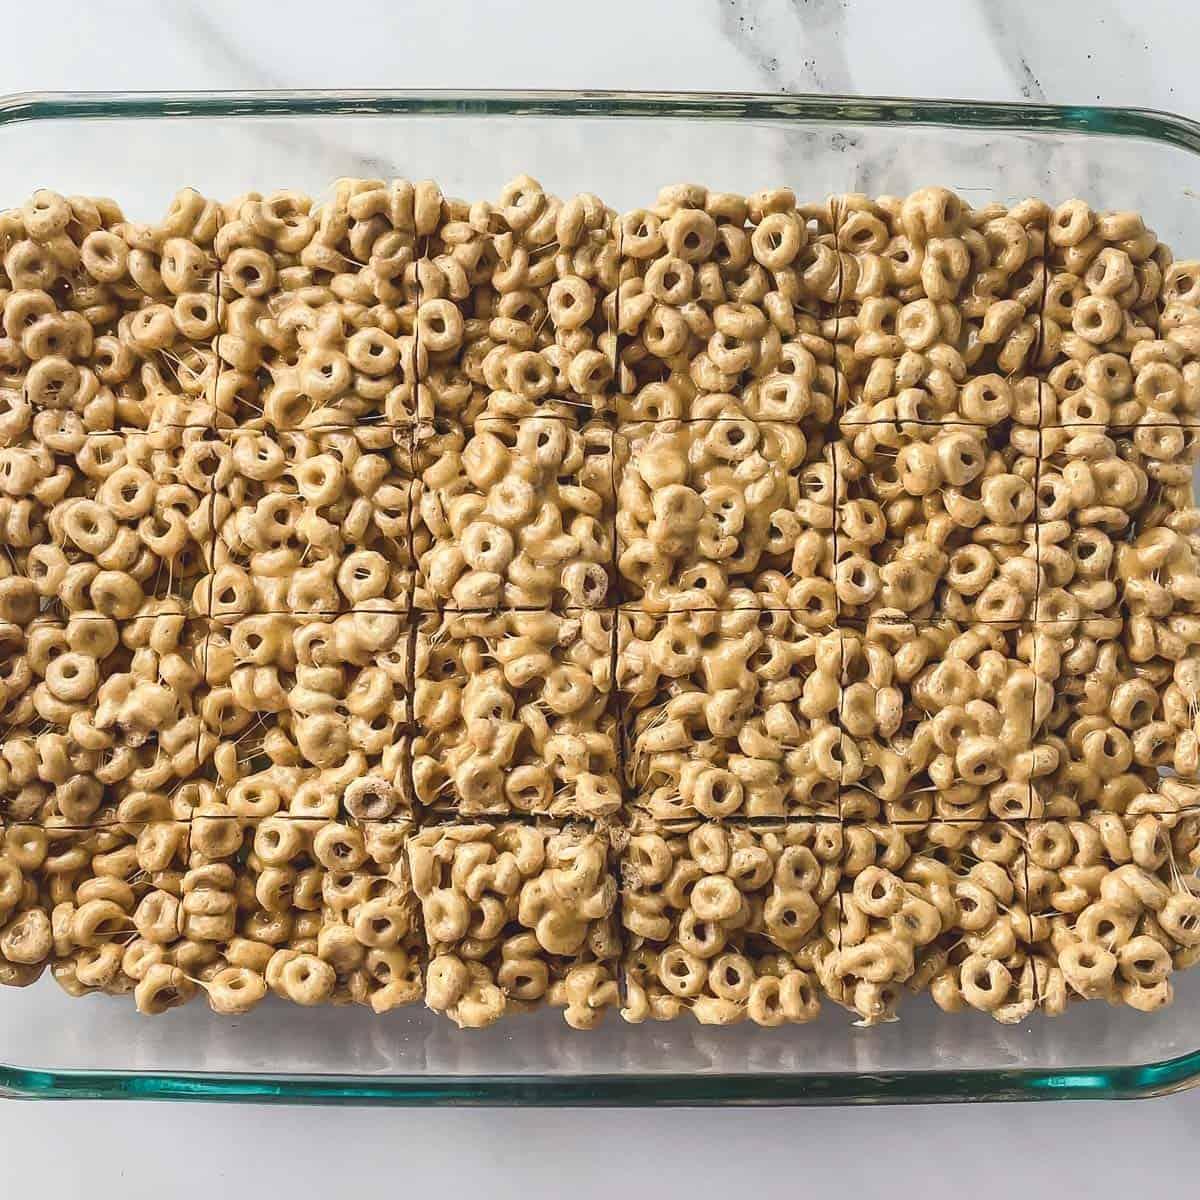 cheerio bars cut into a grid in a glass pan